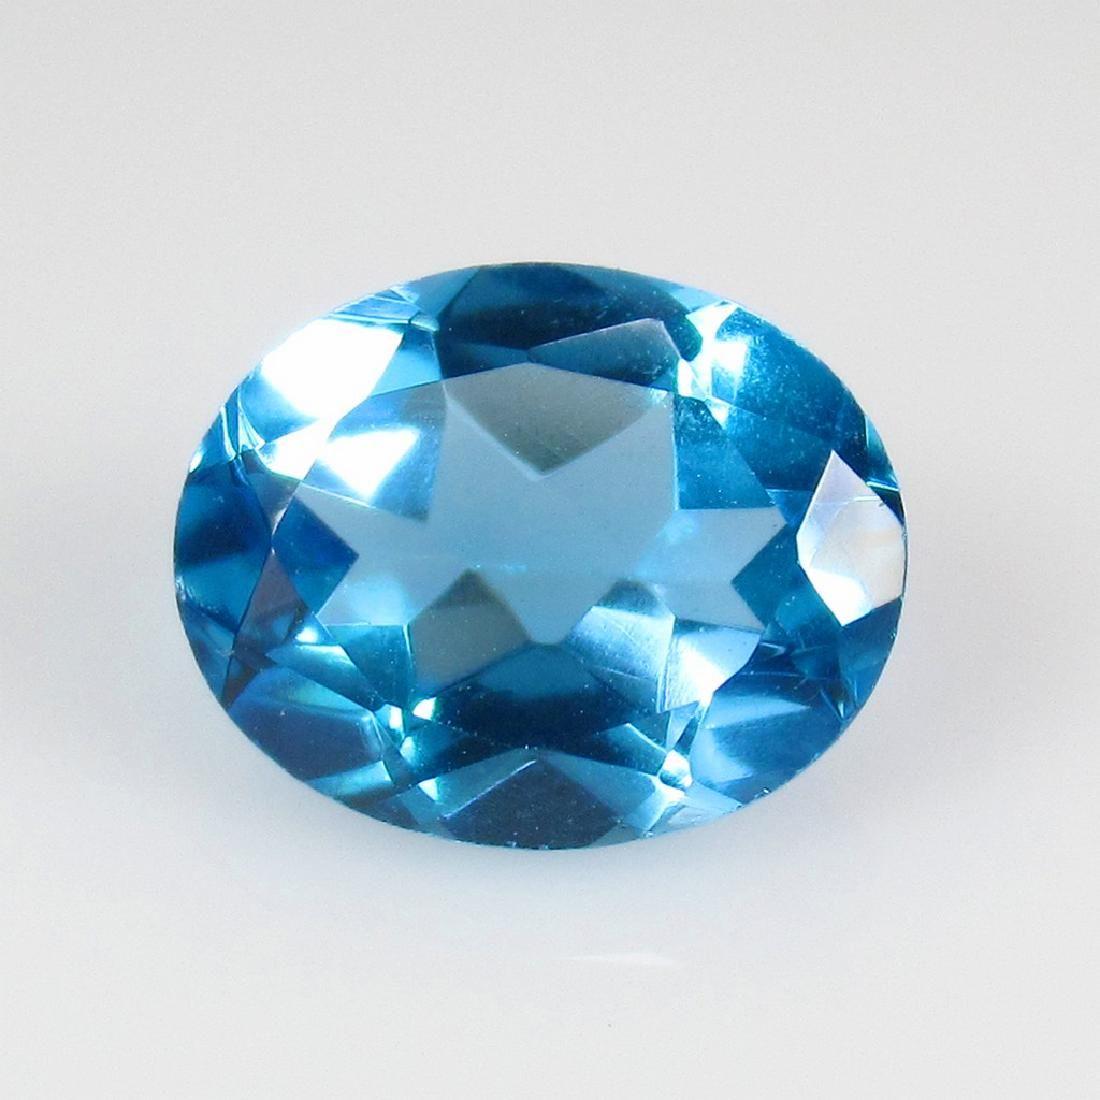 3.22 Ct Genuine Swiss Blue Topaz 10X8 mm Oval Cut